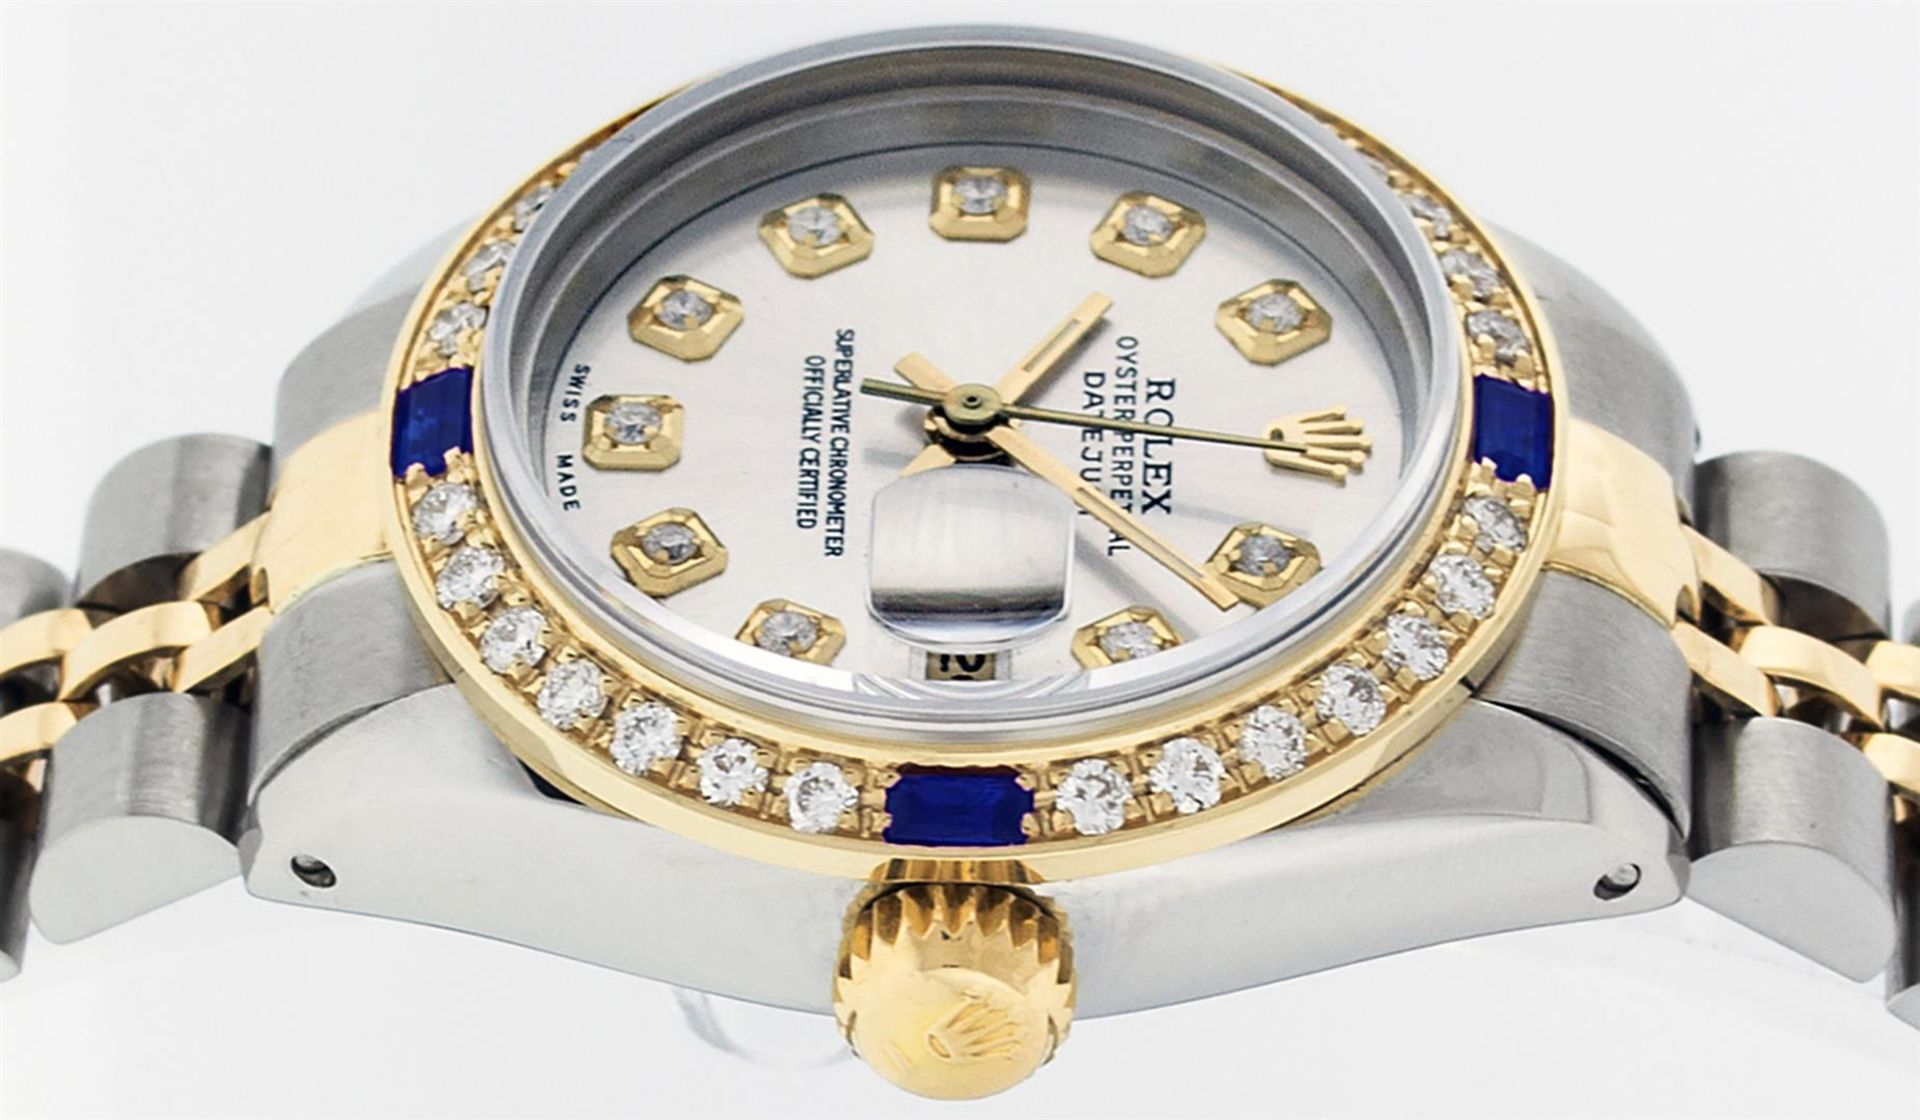 Rolex Ladies 2 Tone Silver Diamond & Sapphire Datejust Wristwatch - Image 5 of 9